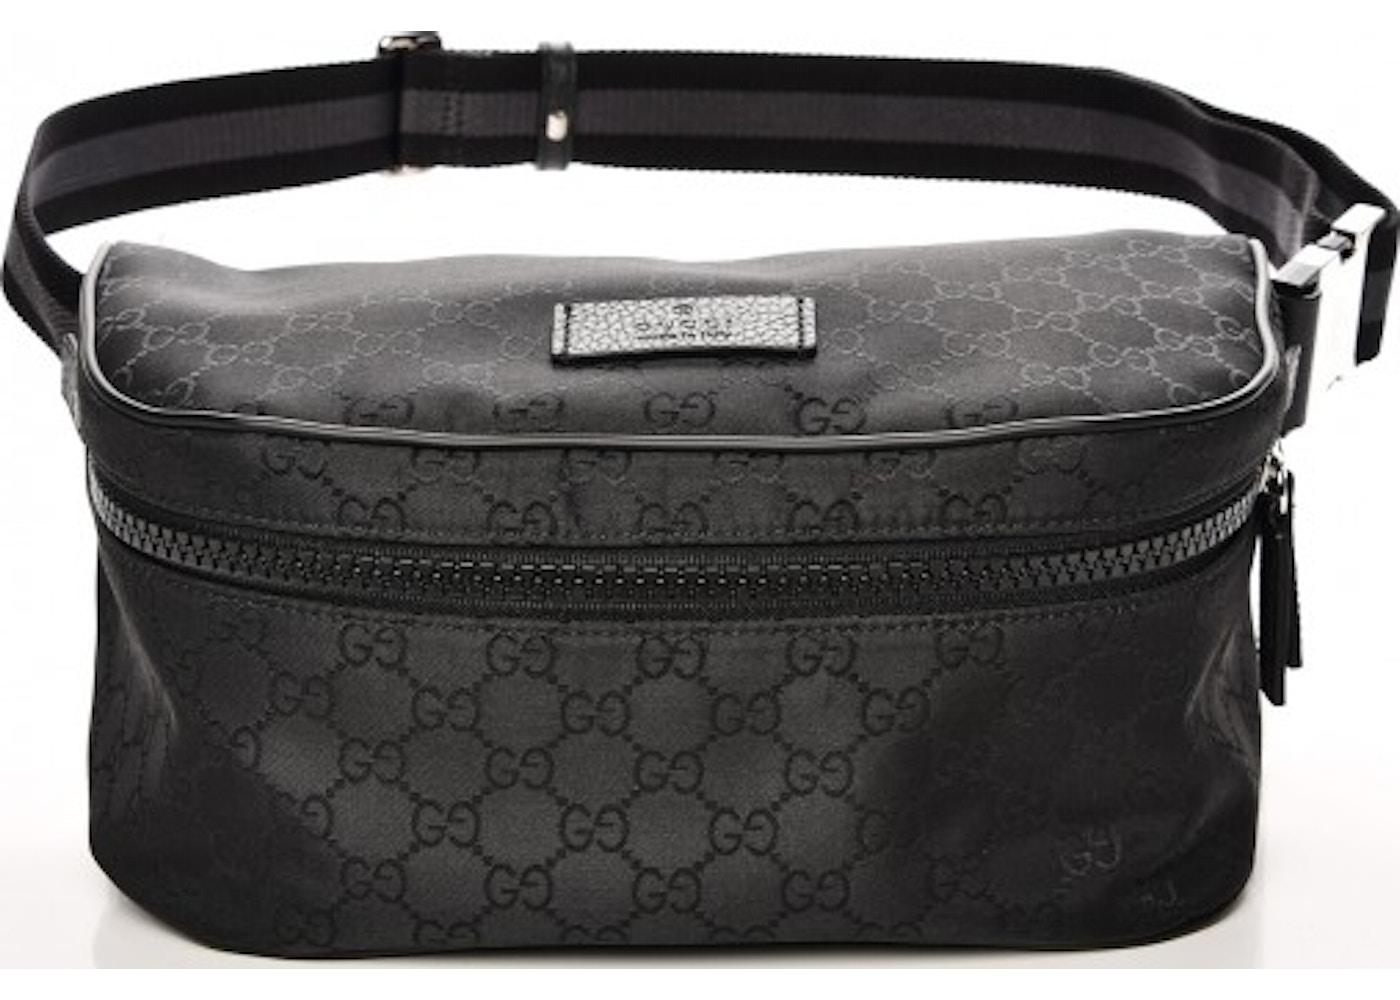 8aa208da841 Buy & Sell Gucci Handbags - Volatility